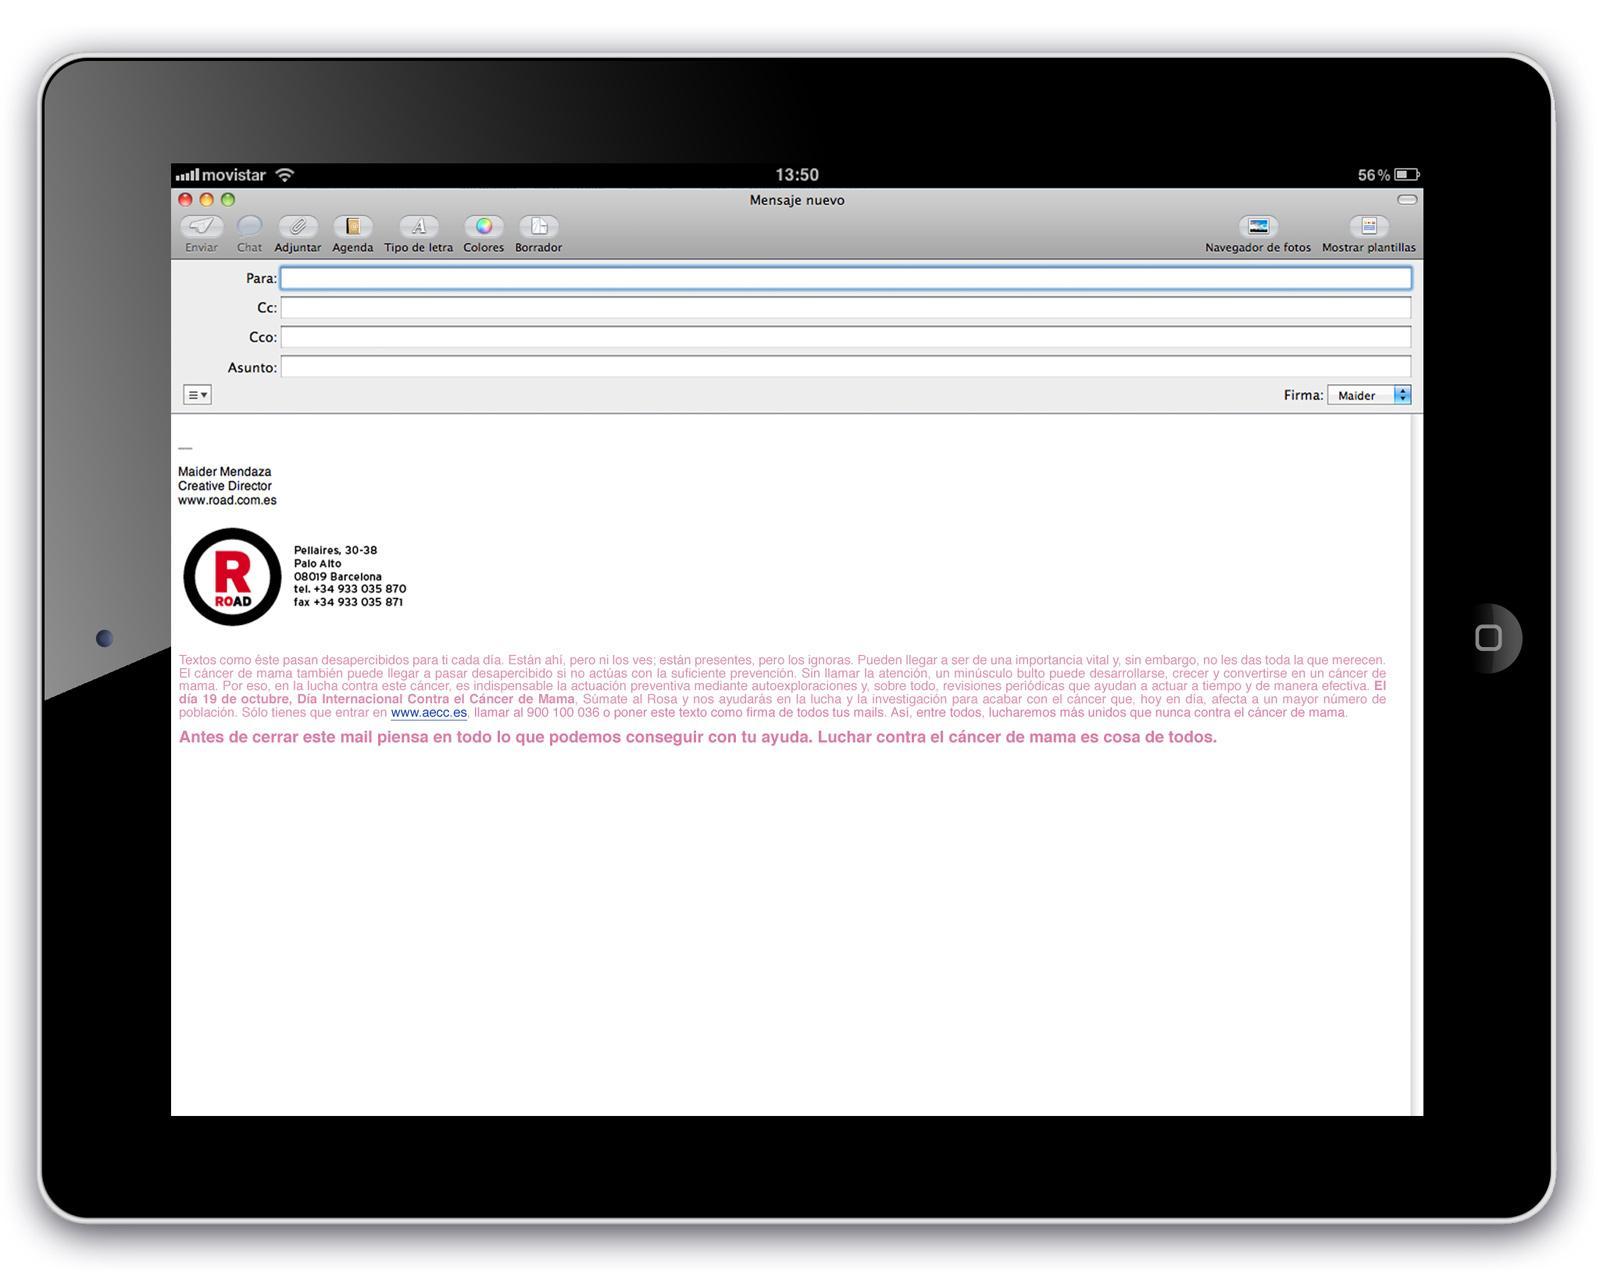 AECC Digital Ad -  Legal Text